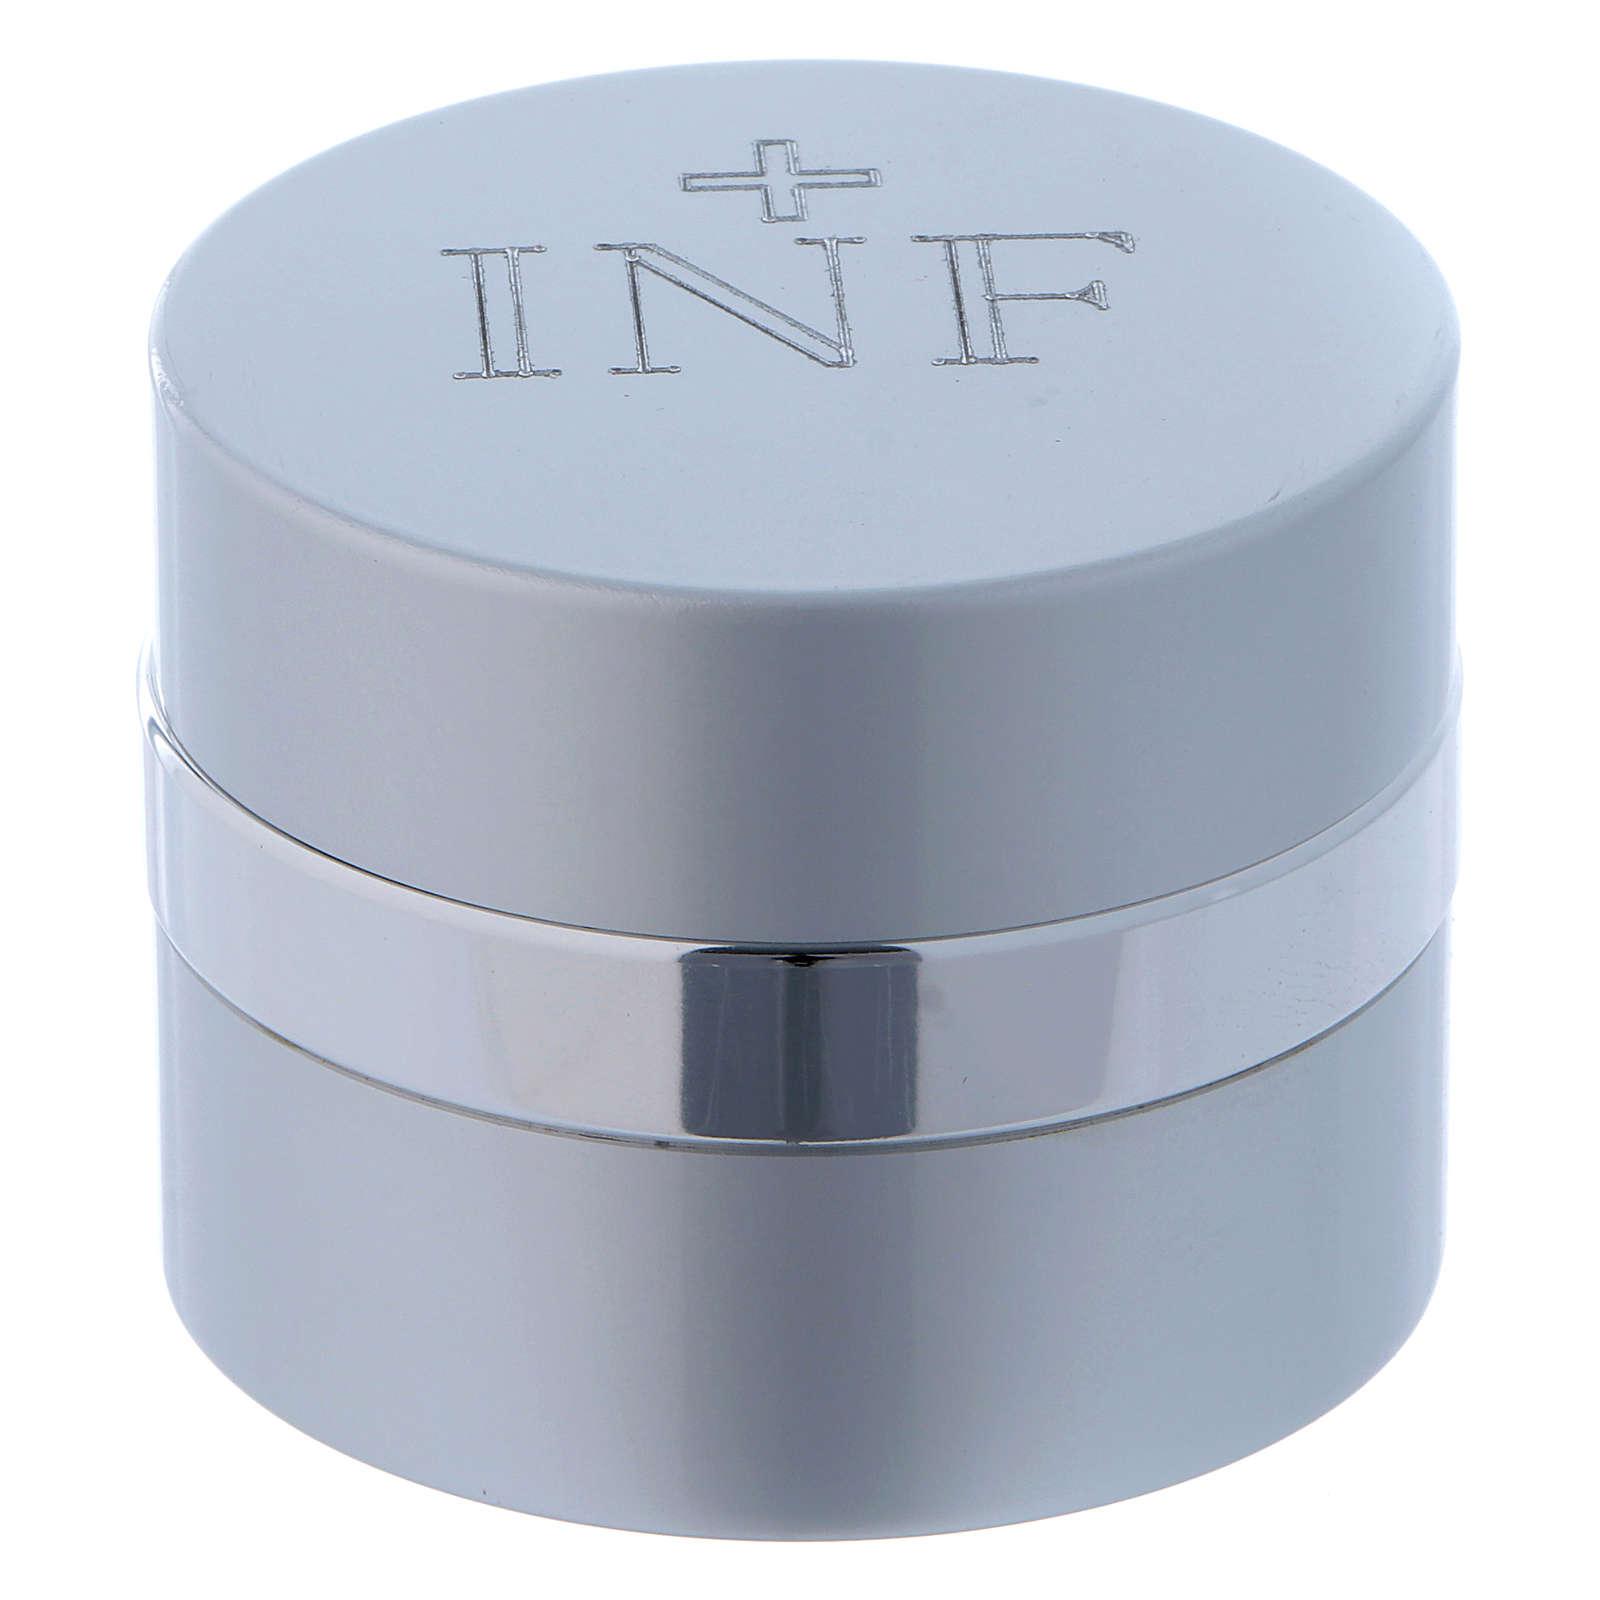 Frasco para Santos Óleos redondo aluminio plateado diámetro 5 cm 3